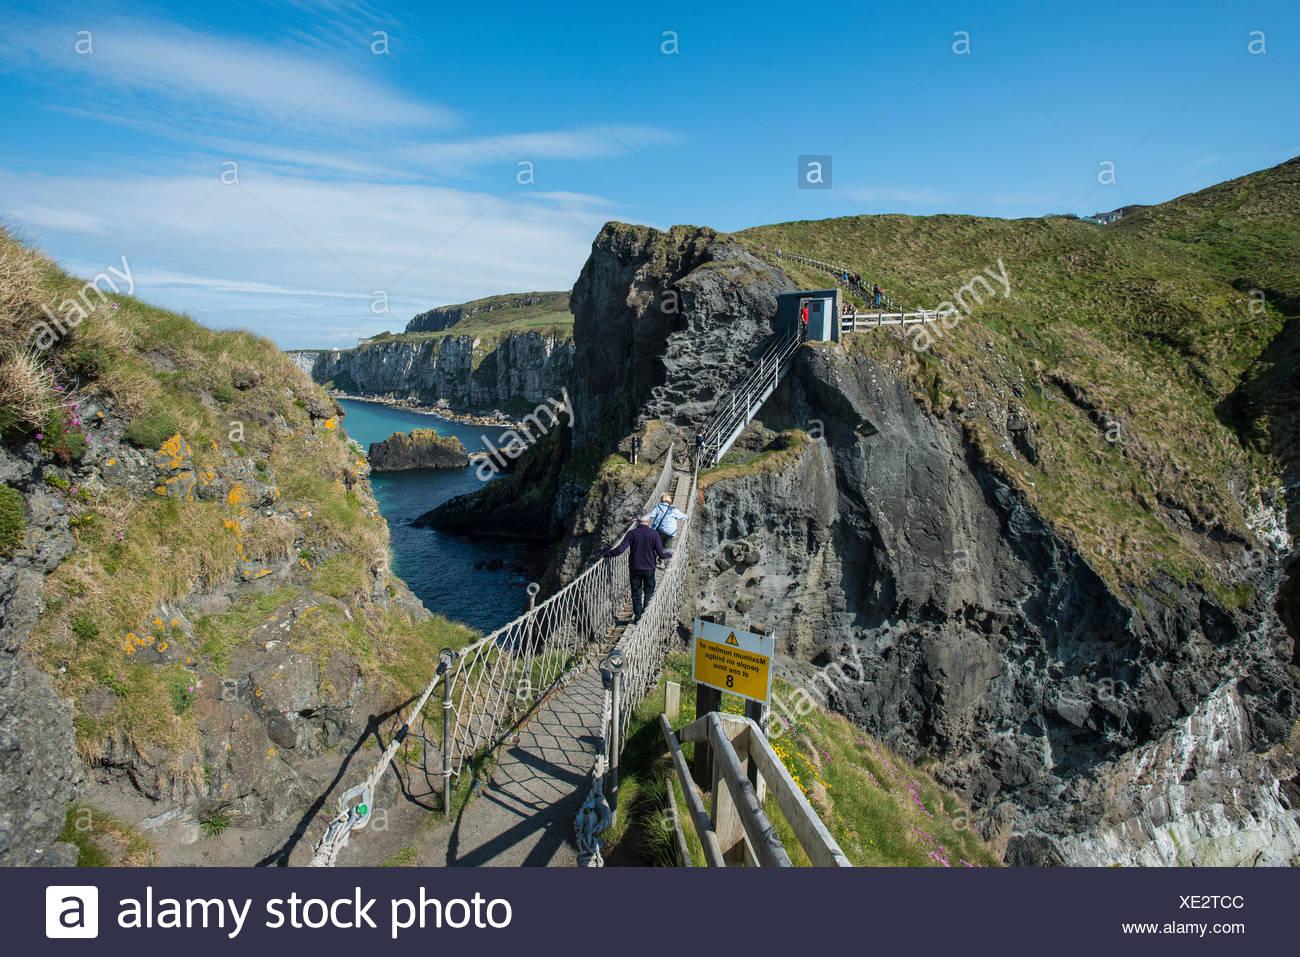 Carrick-a-Rede Bridge, suspension bridge, Moyle, Northern Ireland, United Kingdom, Europe - Stock Image